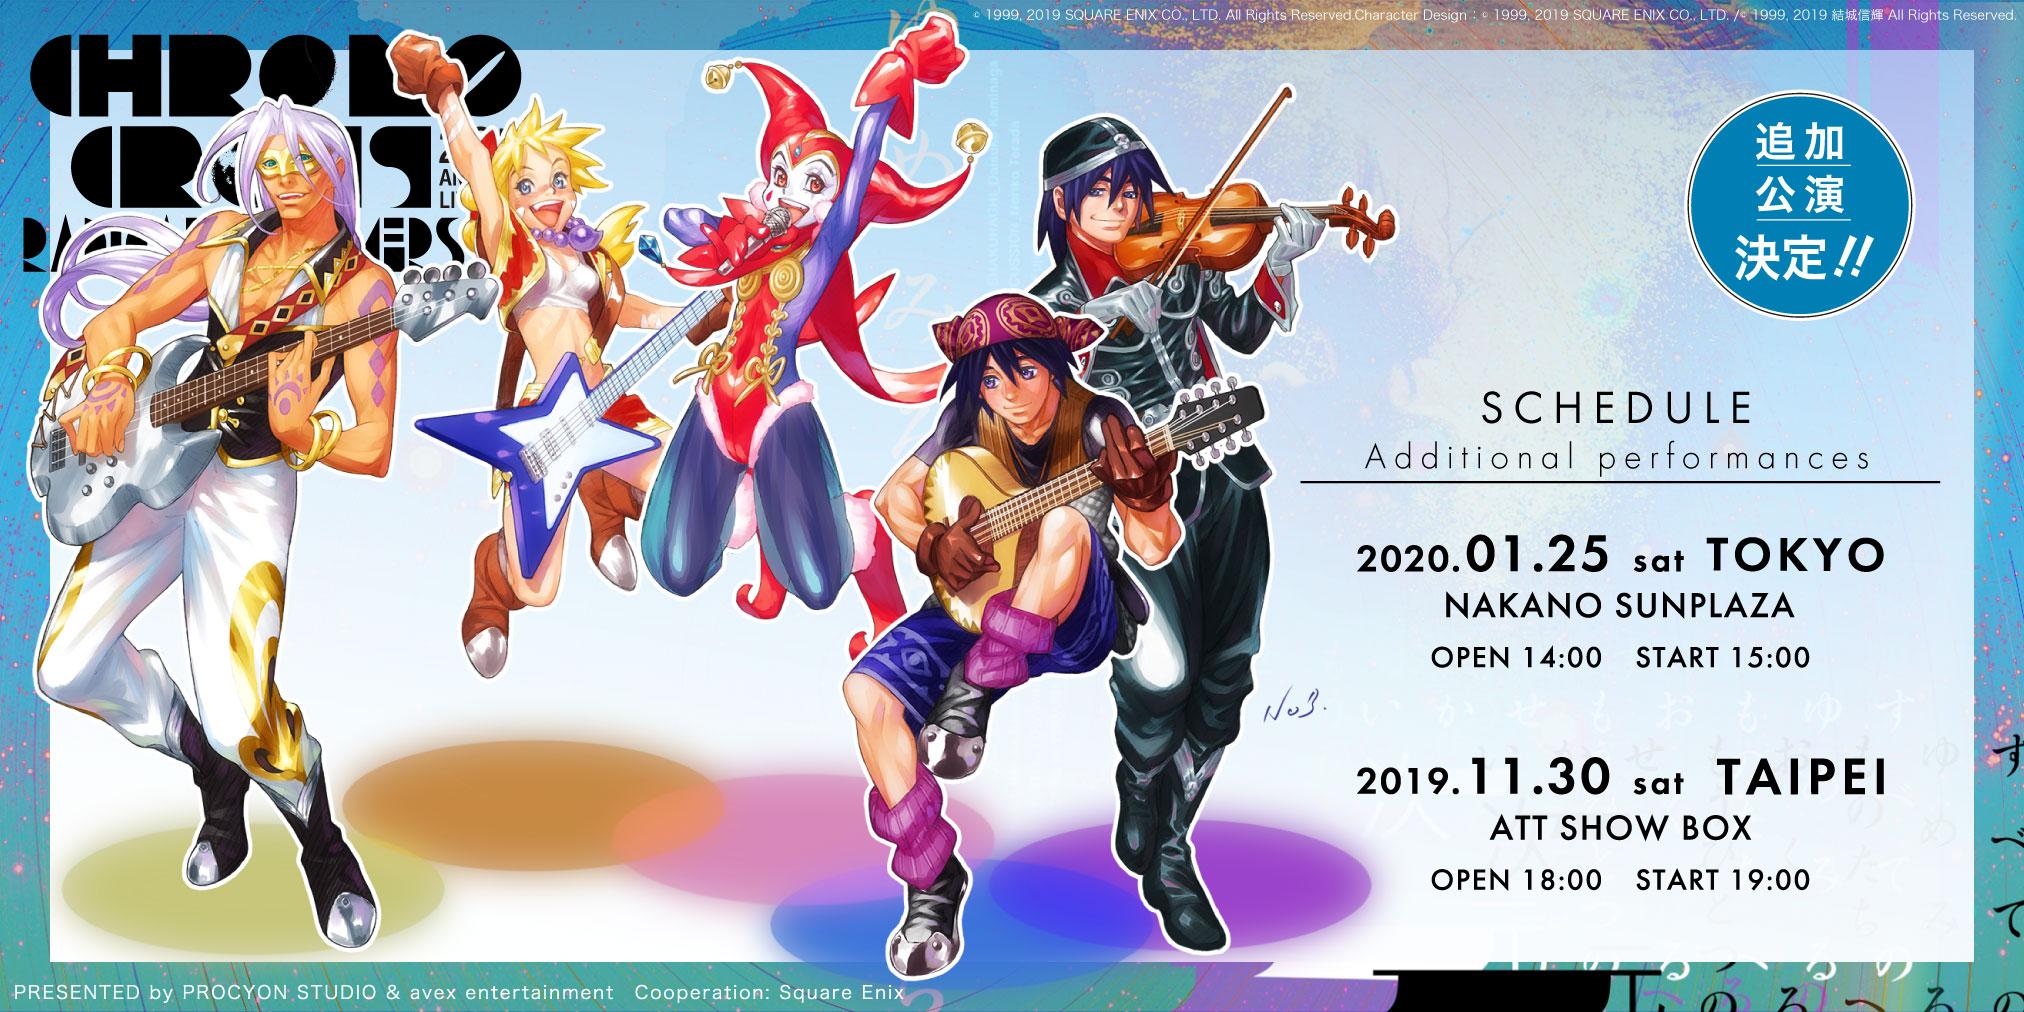 【Tokyo Additional performances】CHRONO CROSS 20th Anniversary Live Tour 2019 RADICAL DREAMERS Yasunori Mitsuda & Millennial Fair